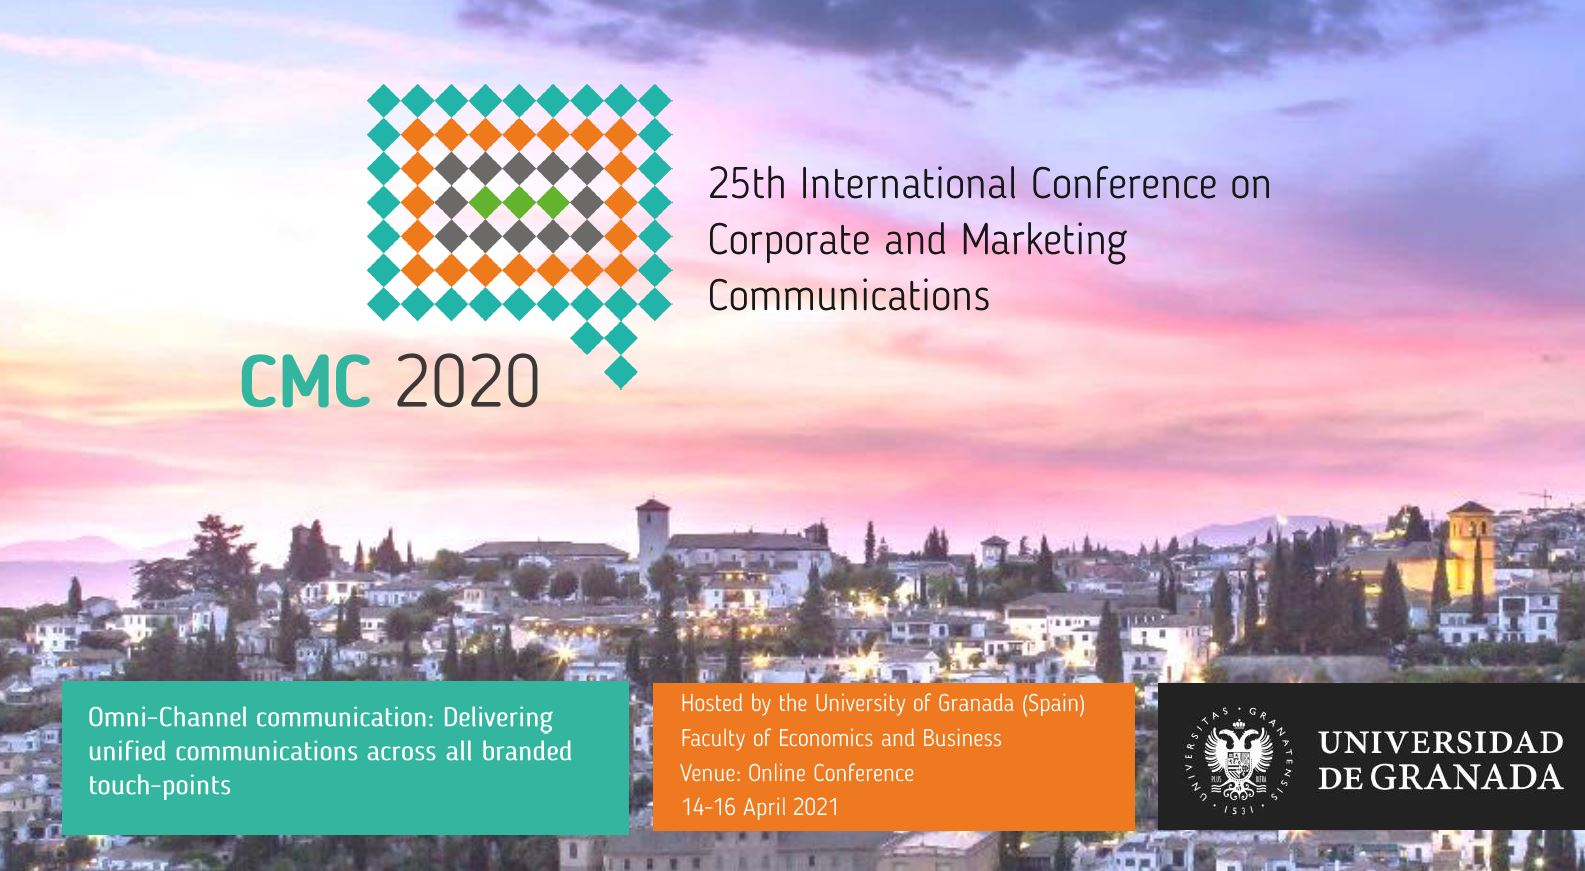 La UGR organiza el 25th International Conference on Corporate and Marketing Communications (CMC2020)